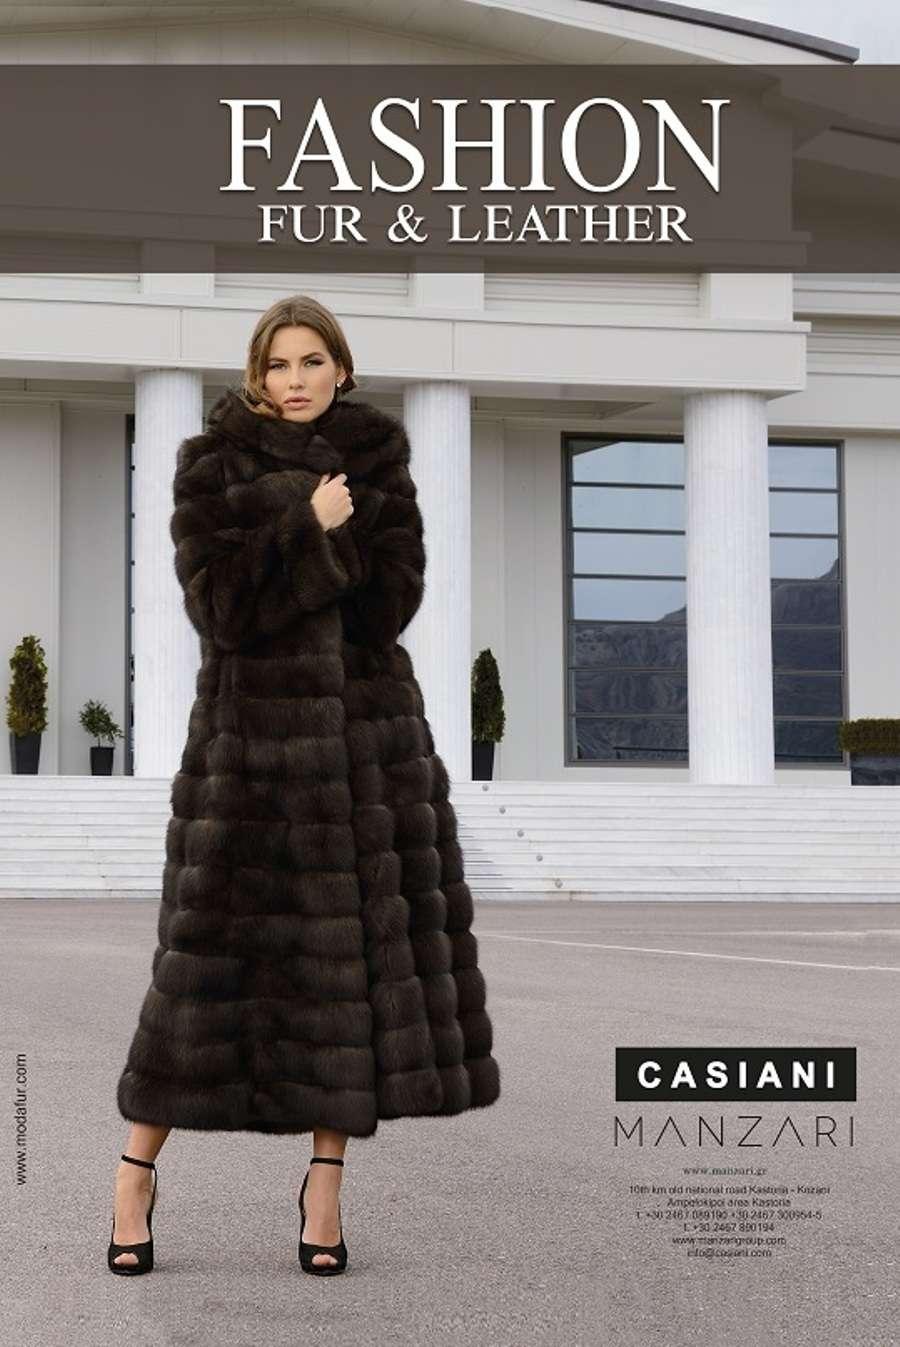 Журнал FASHION Fur&Leather, №4